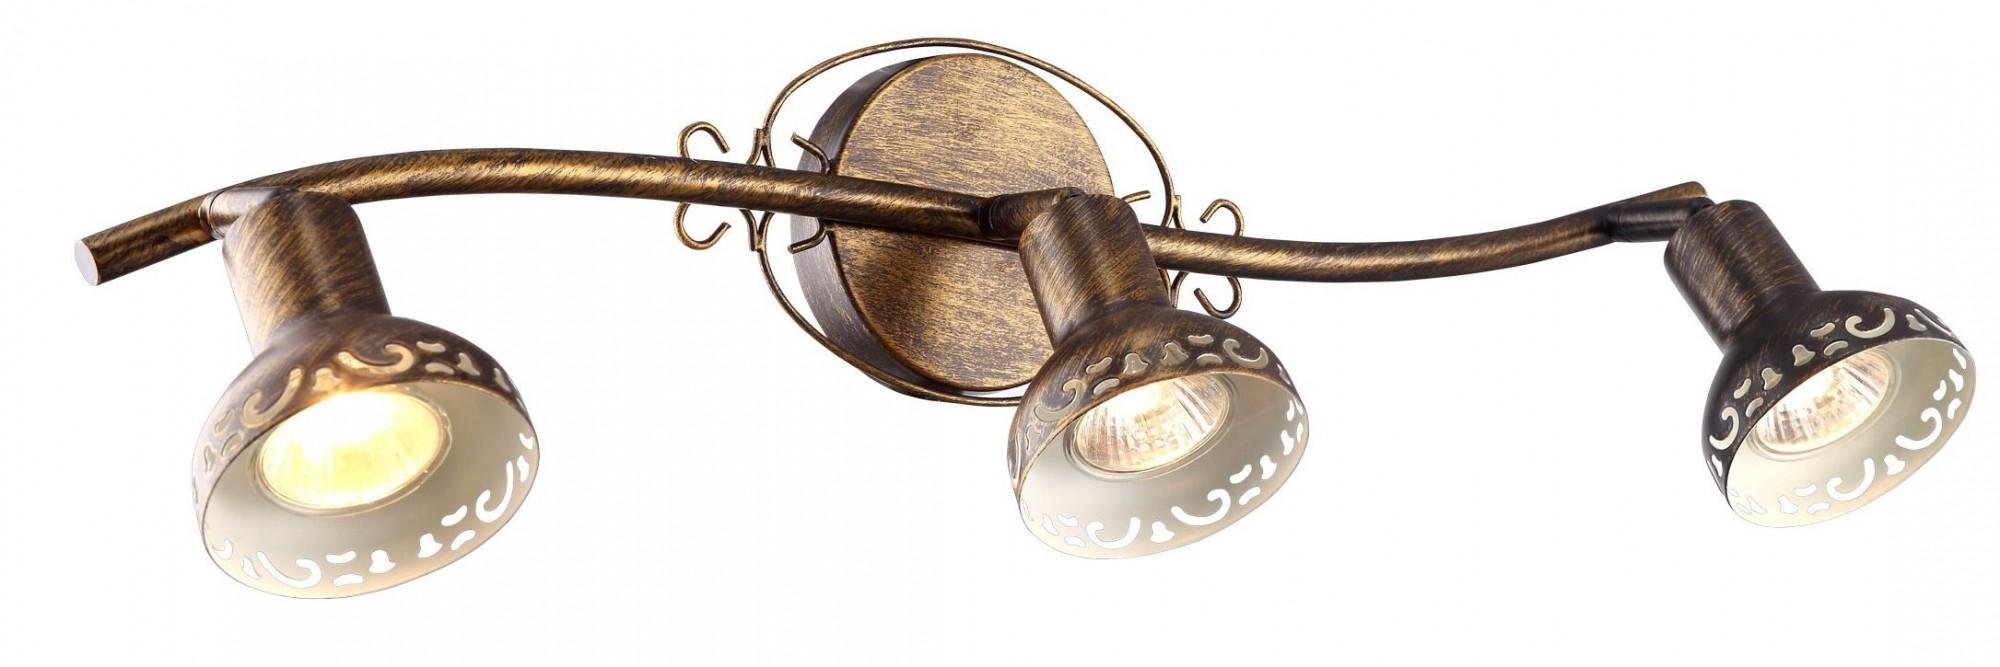 Фото товара A5219PL-3BR Arte Lamp